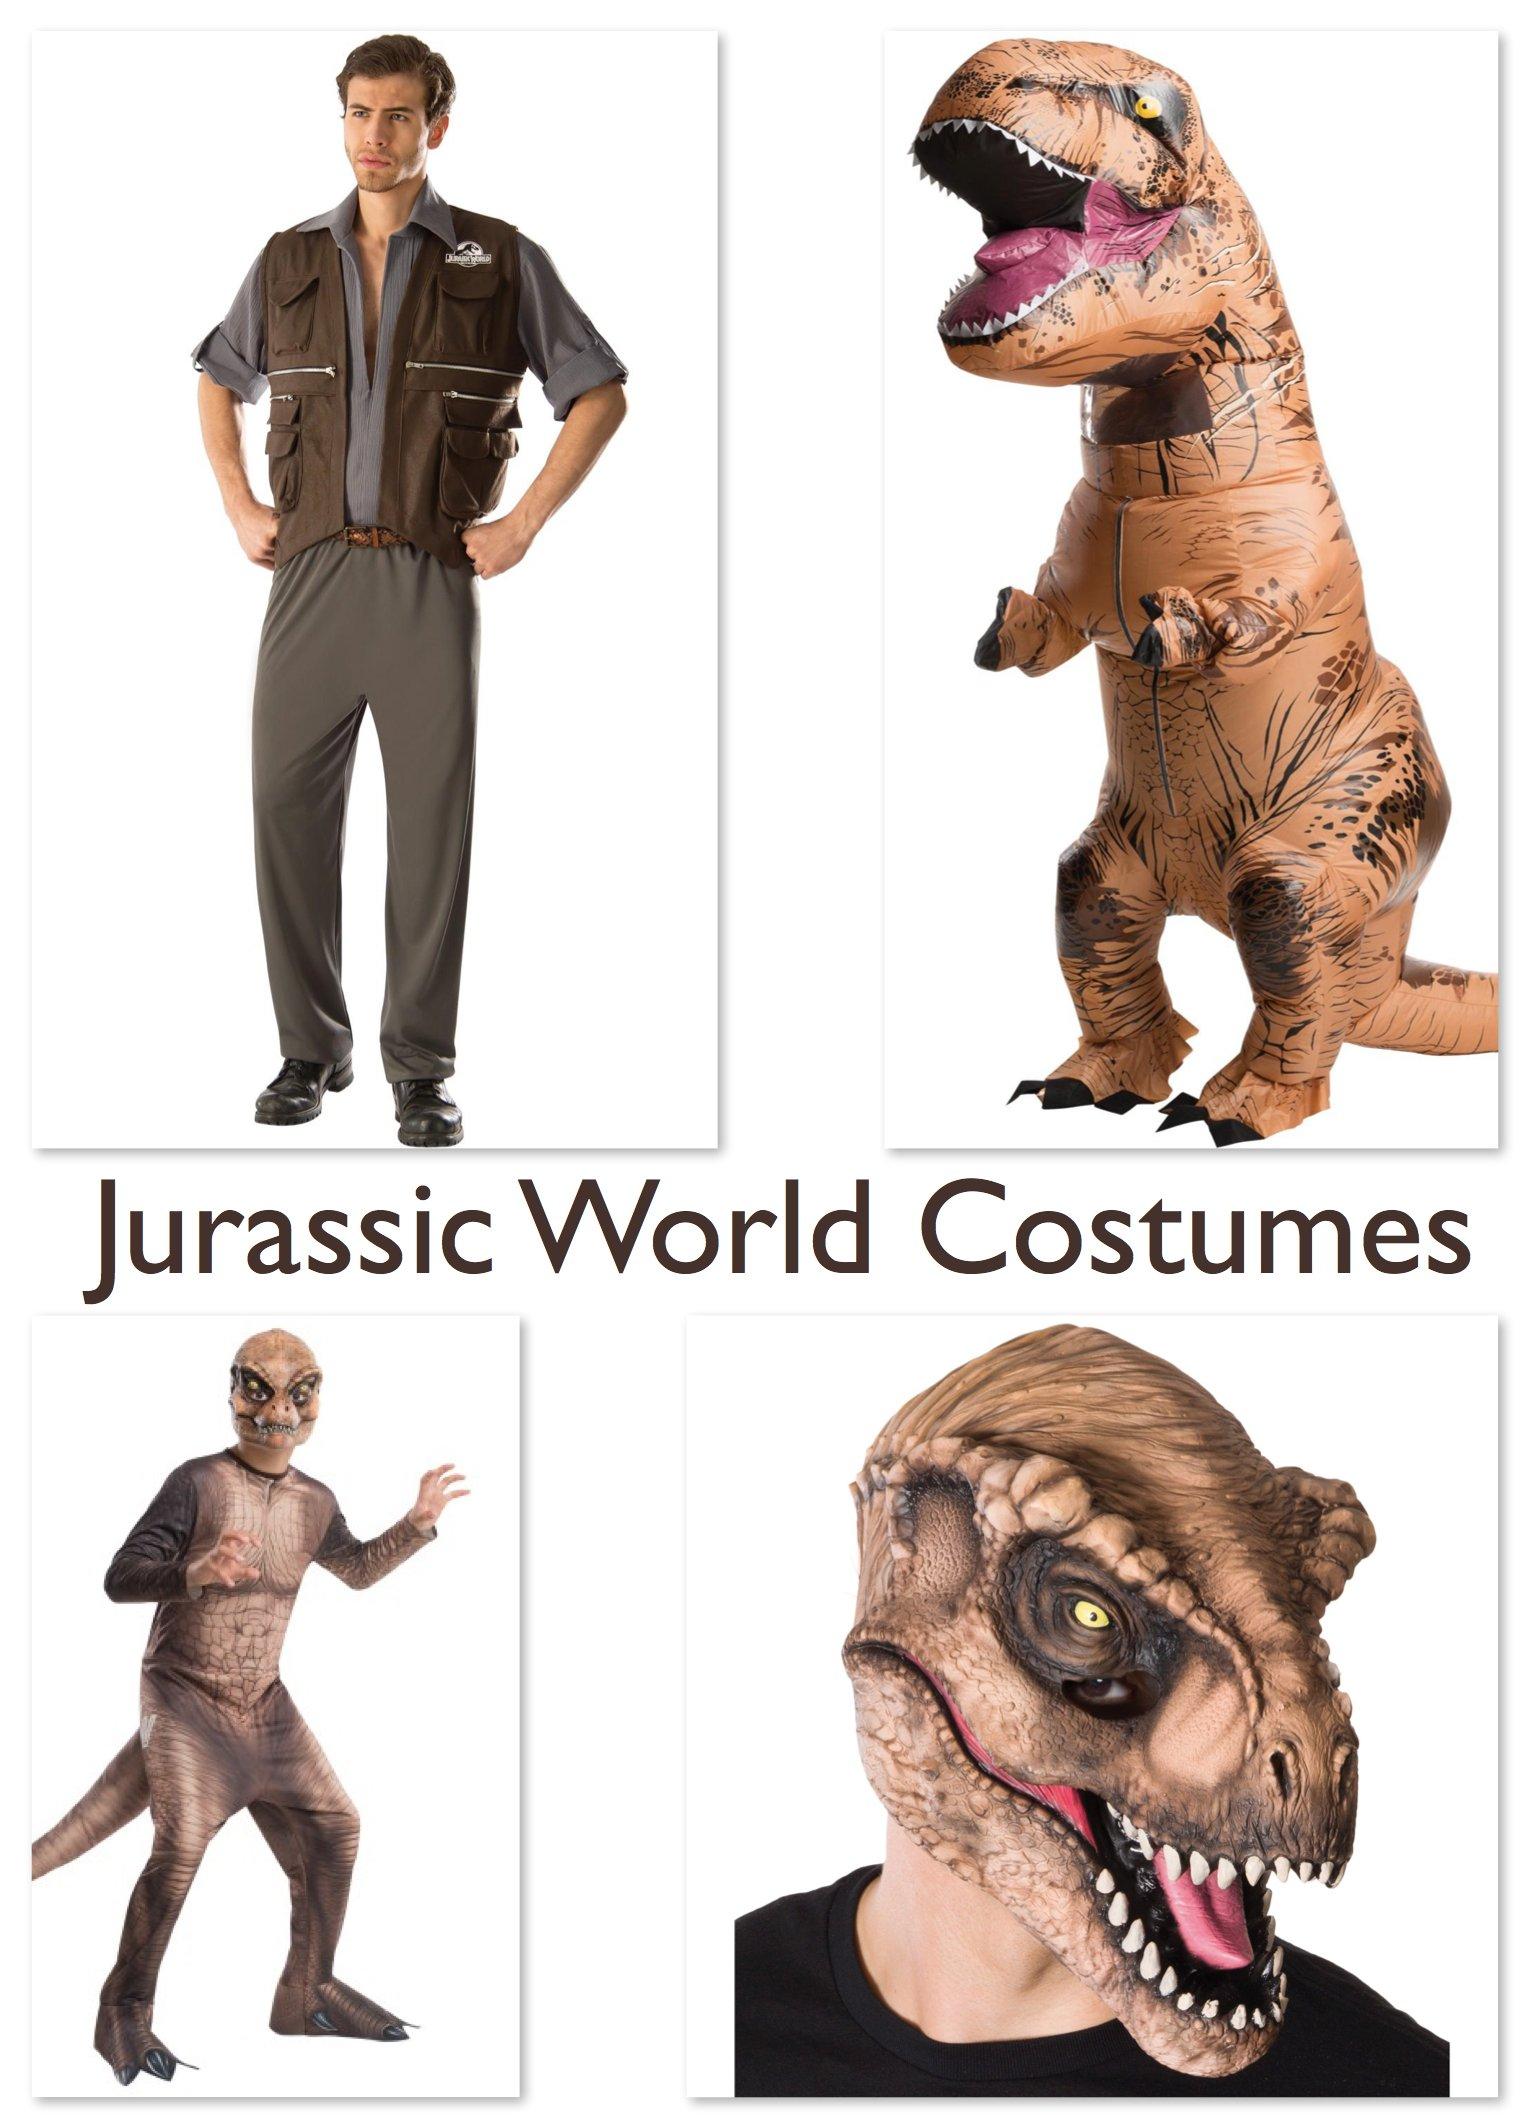 Jurassic World Costumes